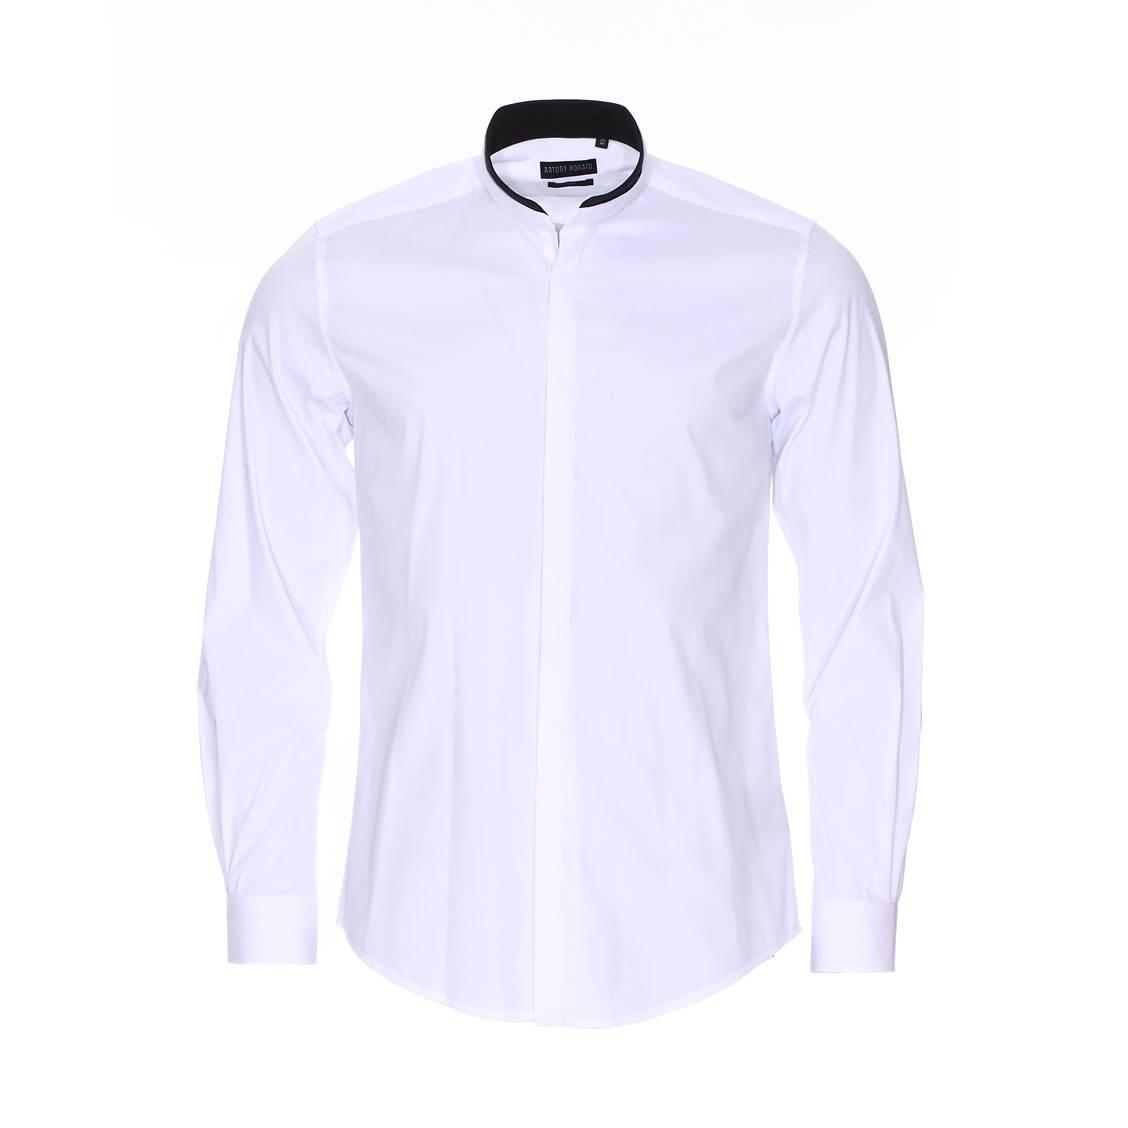 chemise cintr e antony morato en coton blanc col mao en simili cuir noir rue des hommes. Black Bedroom Furniture Sets. Home Design Ideas